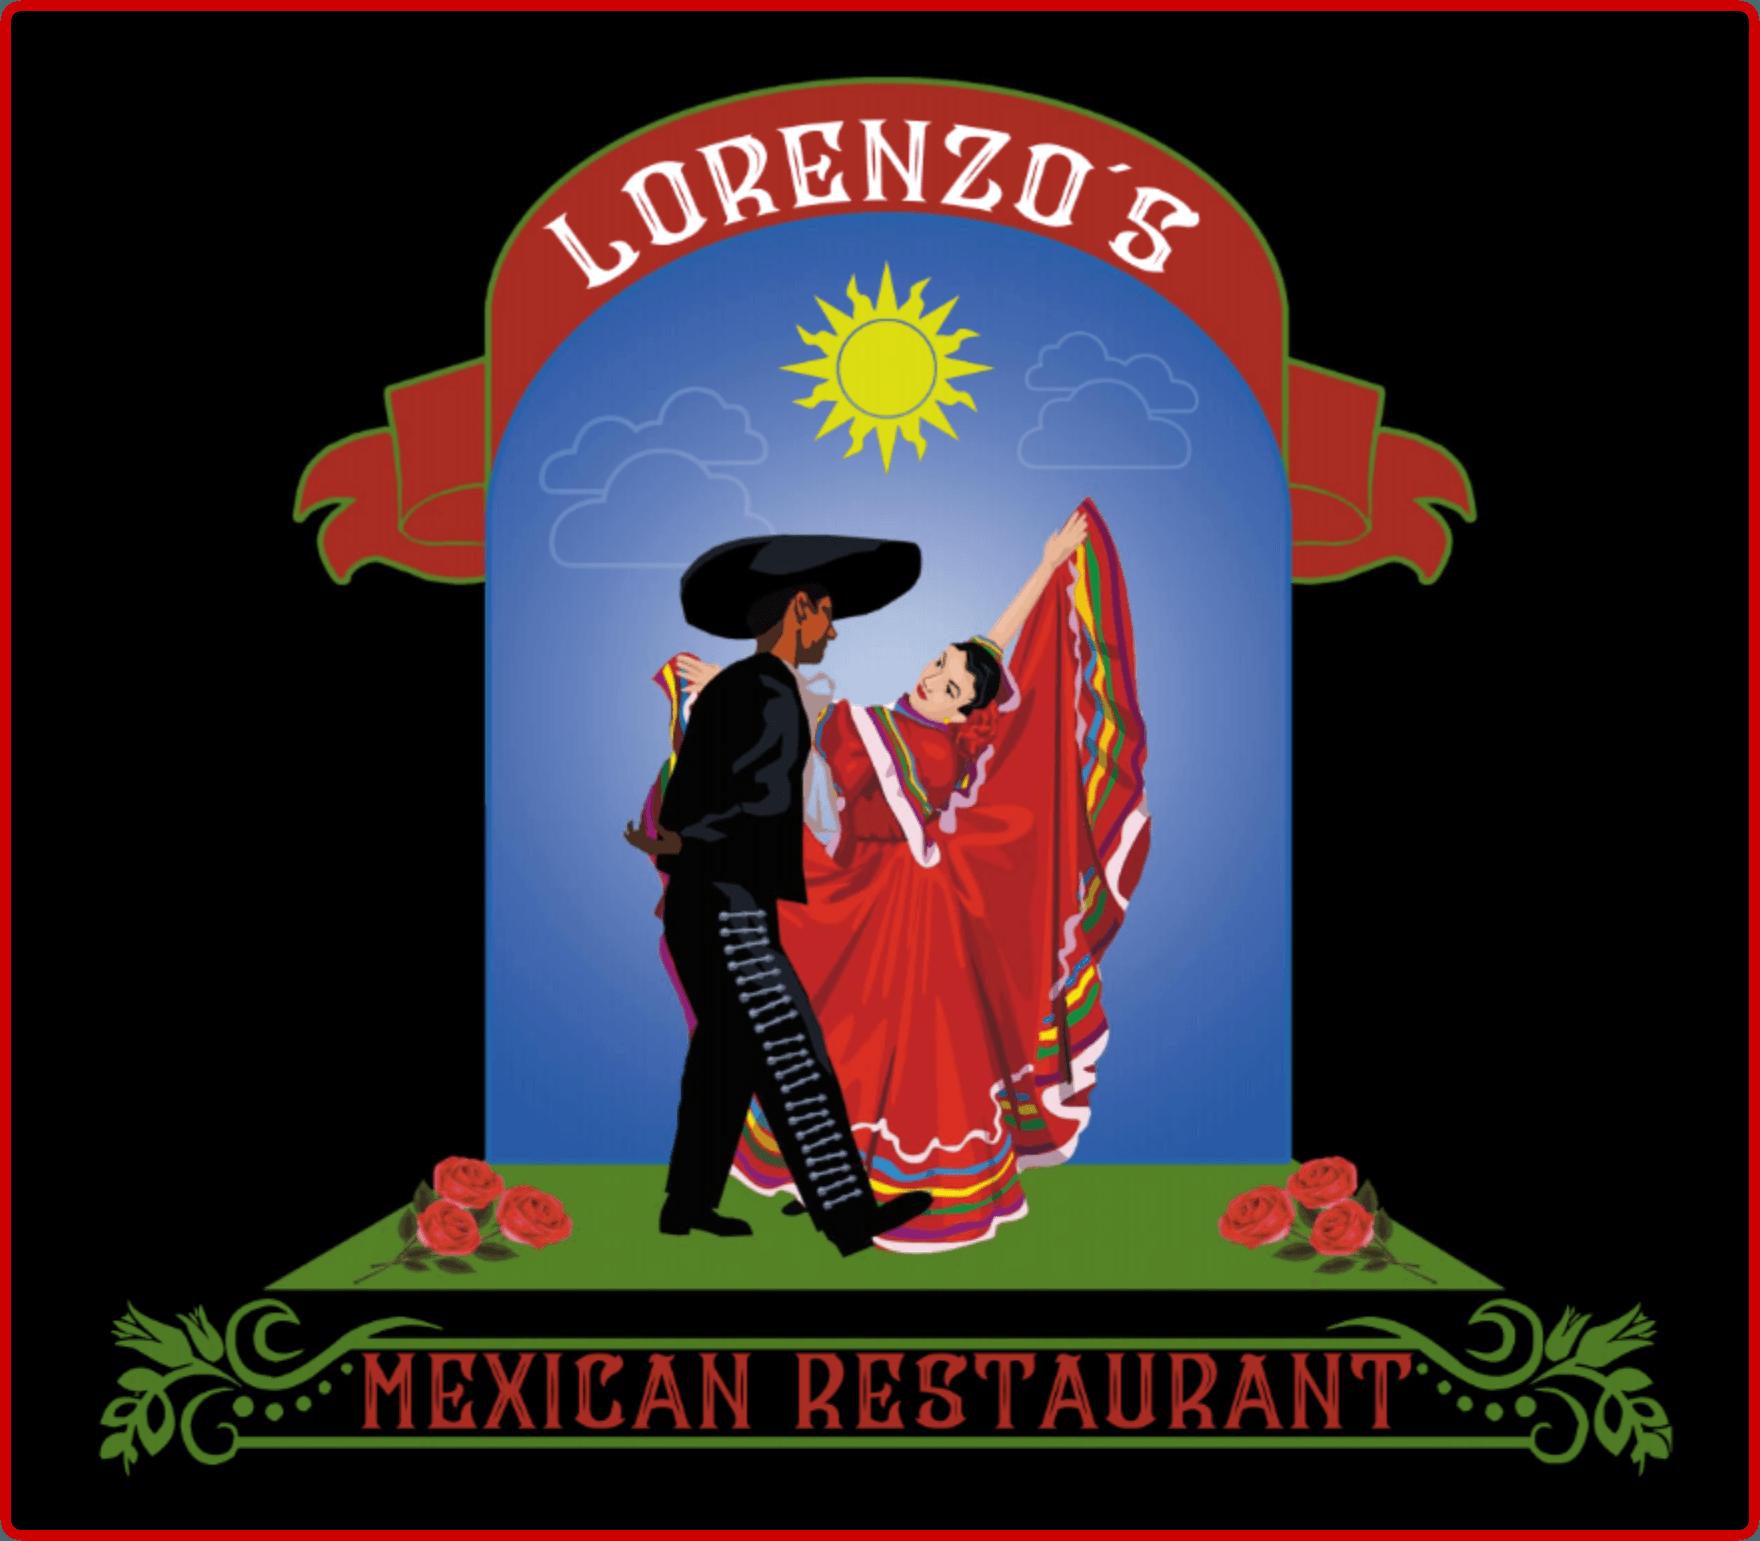 Lorenzo's Mexican Restaurant logo